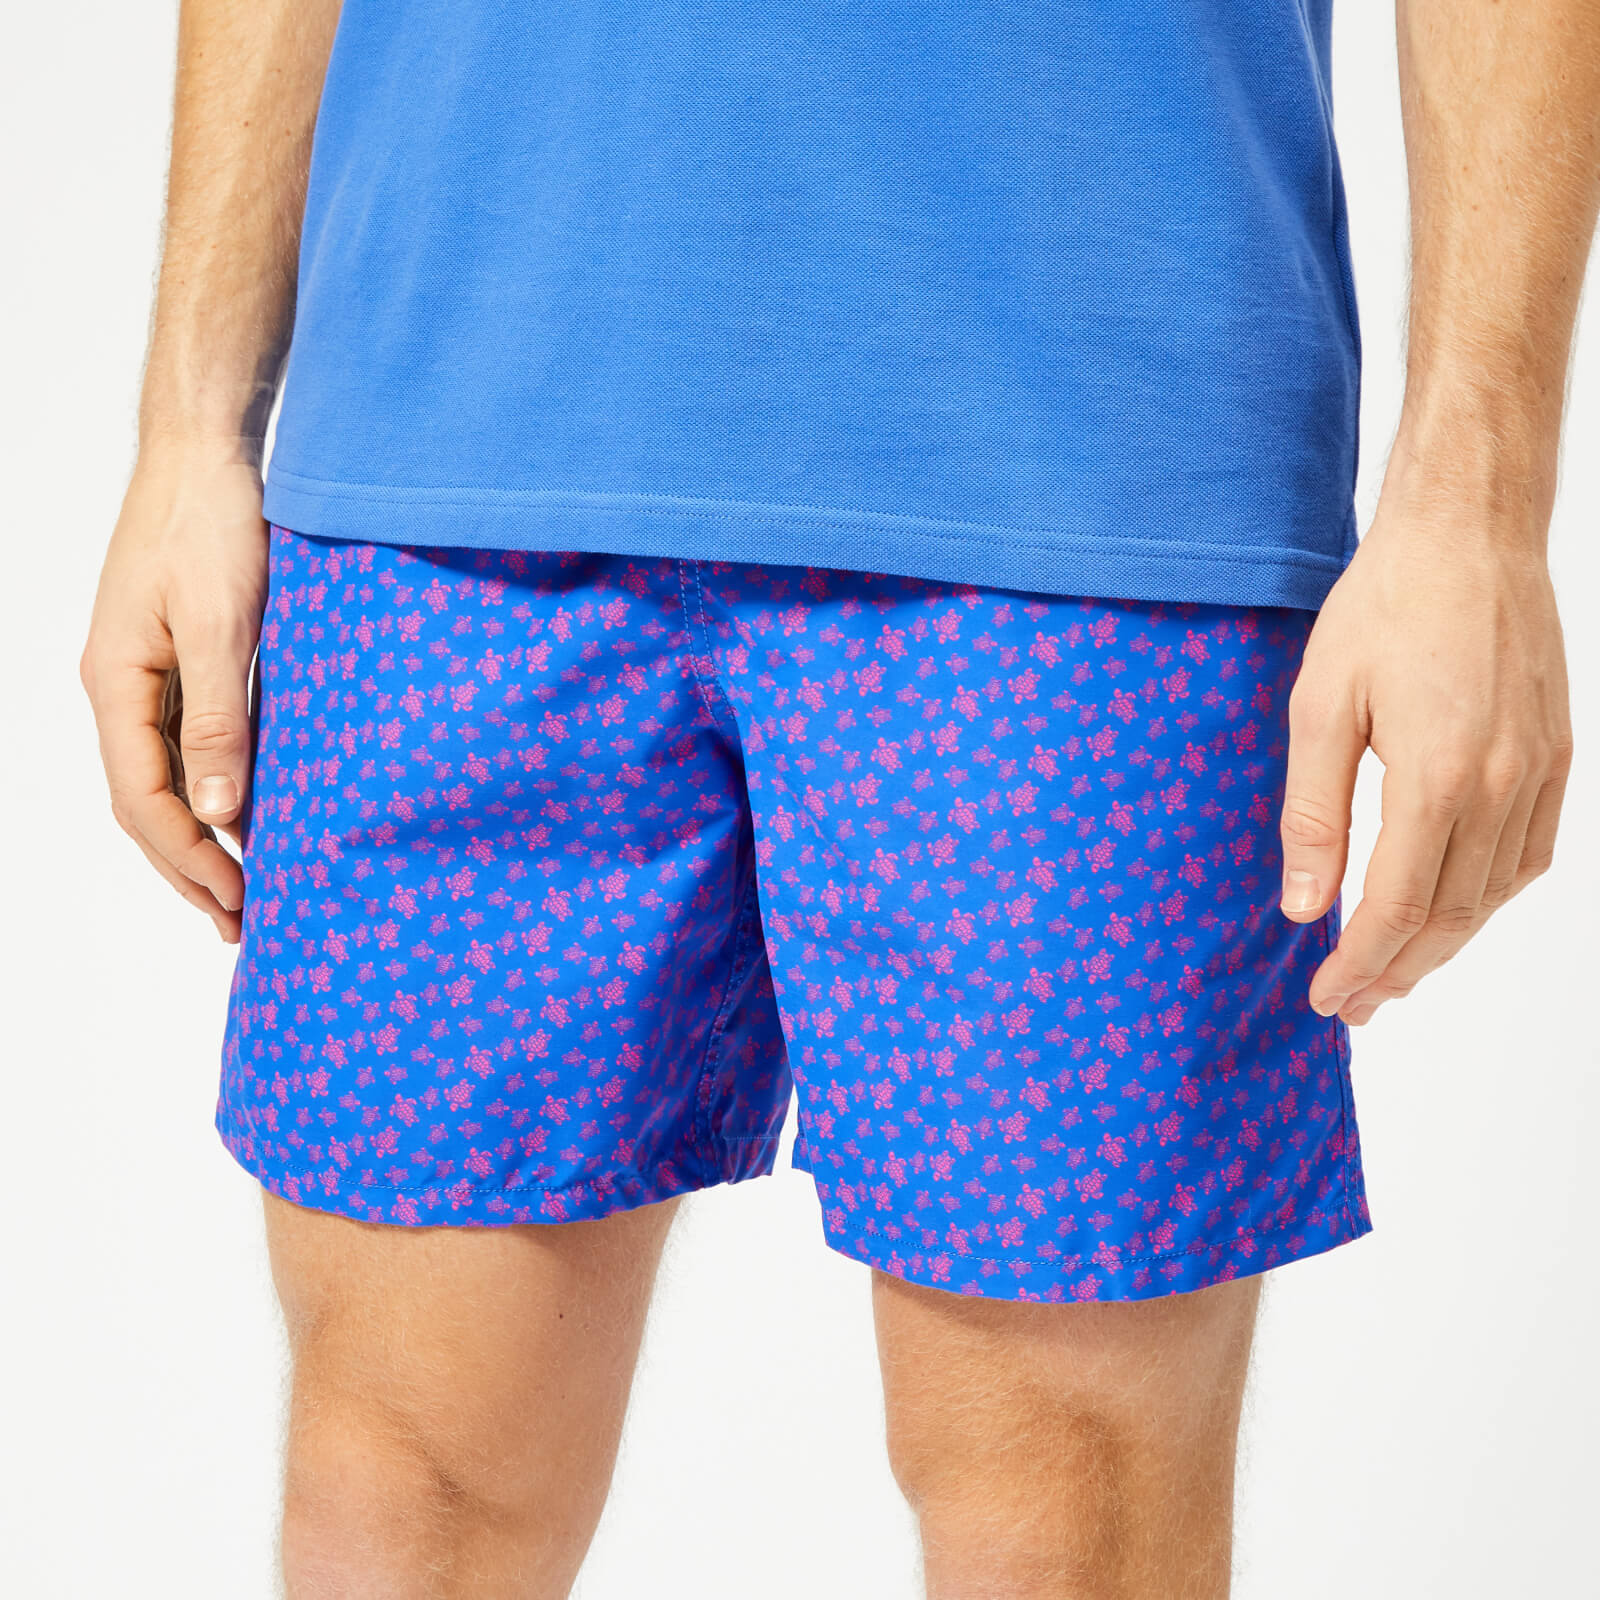 029159682f Vilebrequin Men's Moorea Small Turtles Swim Shorts - Sea Blue - Free UK  Delivery over £50